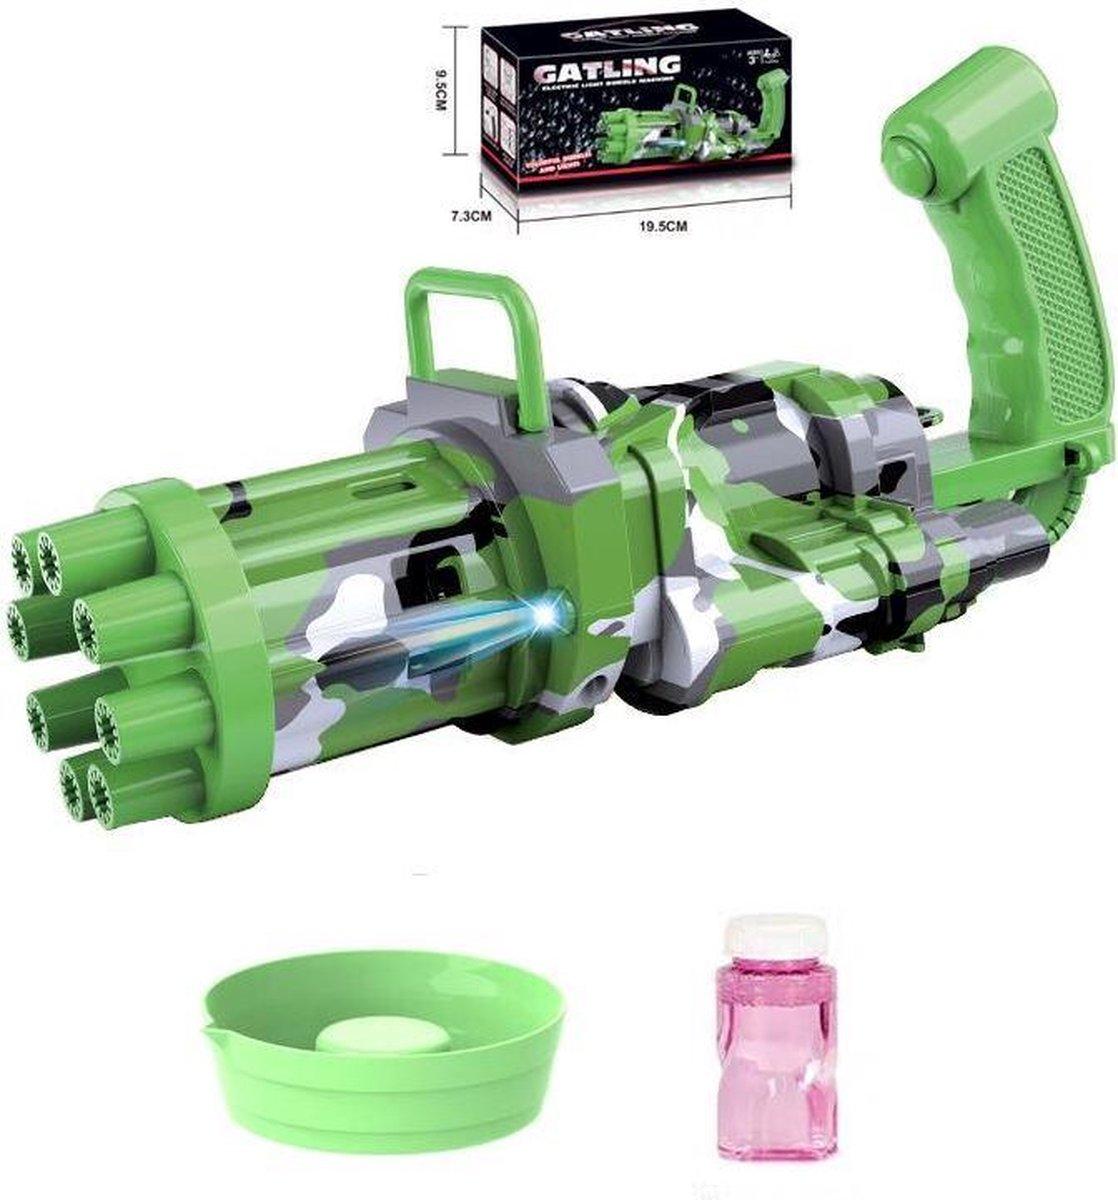 Bellenblaas pistool - Bubble gun - Bubble blaster - elektrische bellenblaas - bellenblaasmachine - bellenblaas speelgoed - werkt op AA batterijen